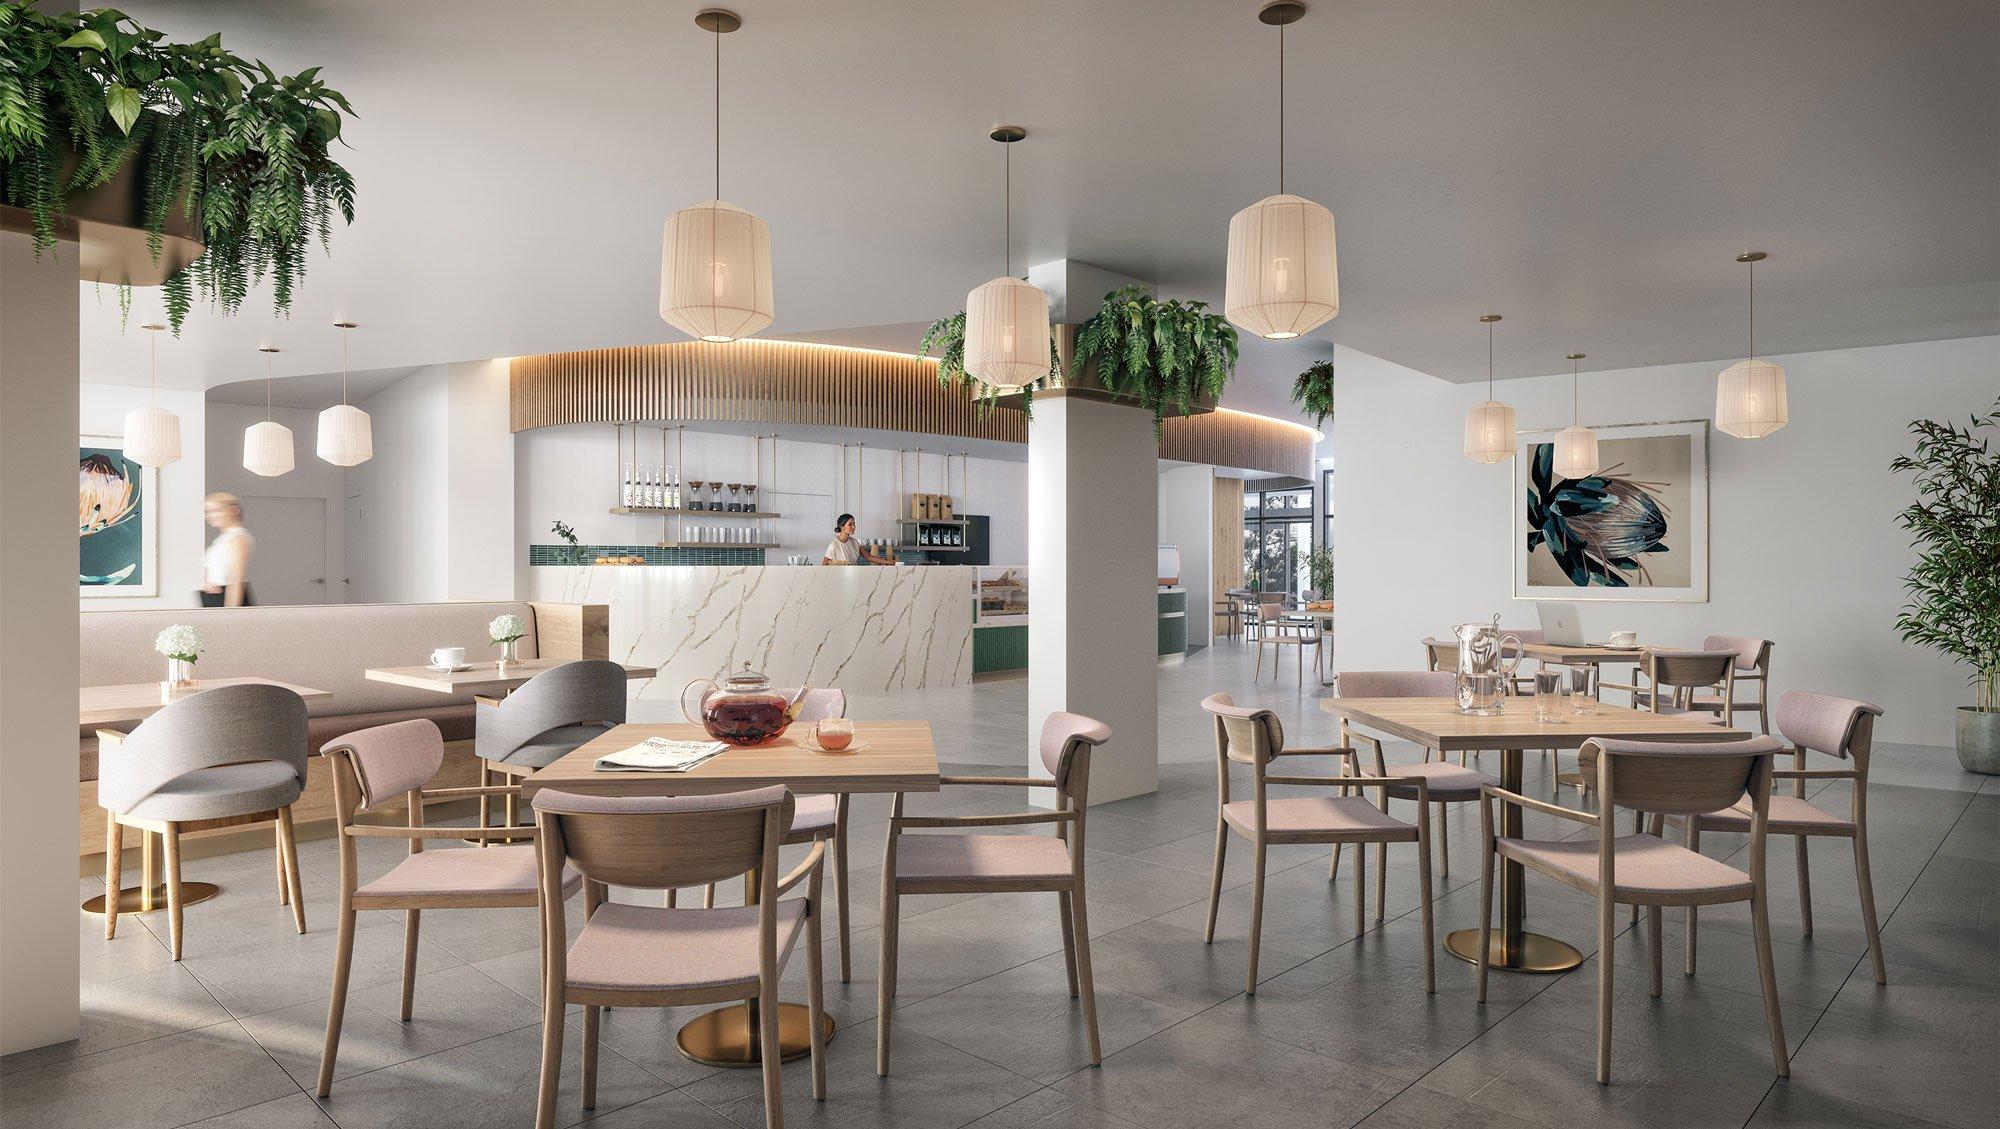 Communal café and dining room at Strathalan Macleod